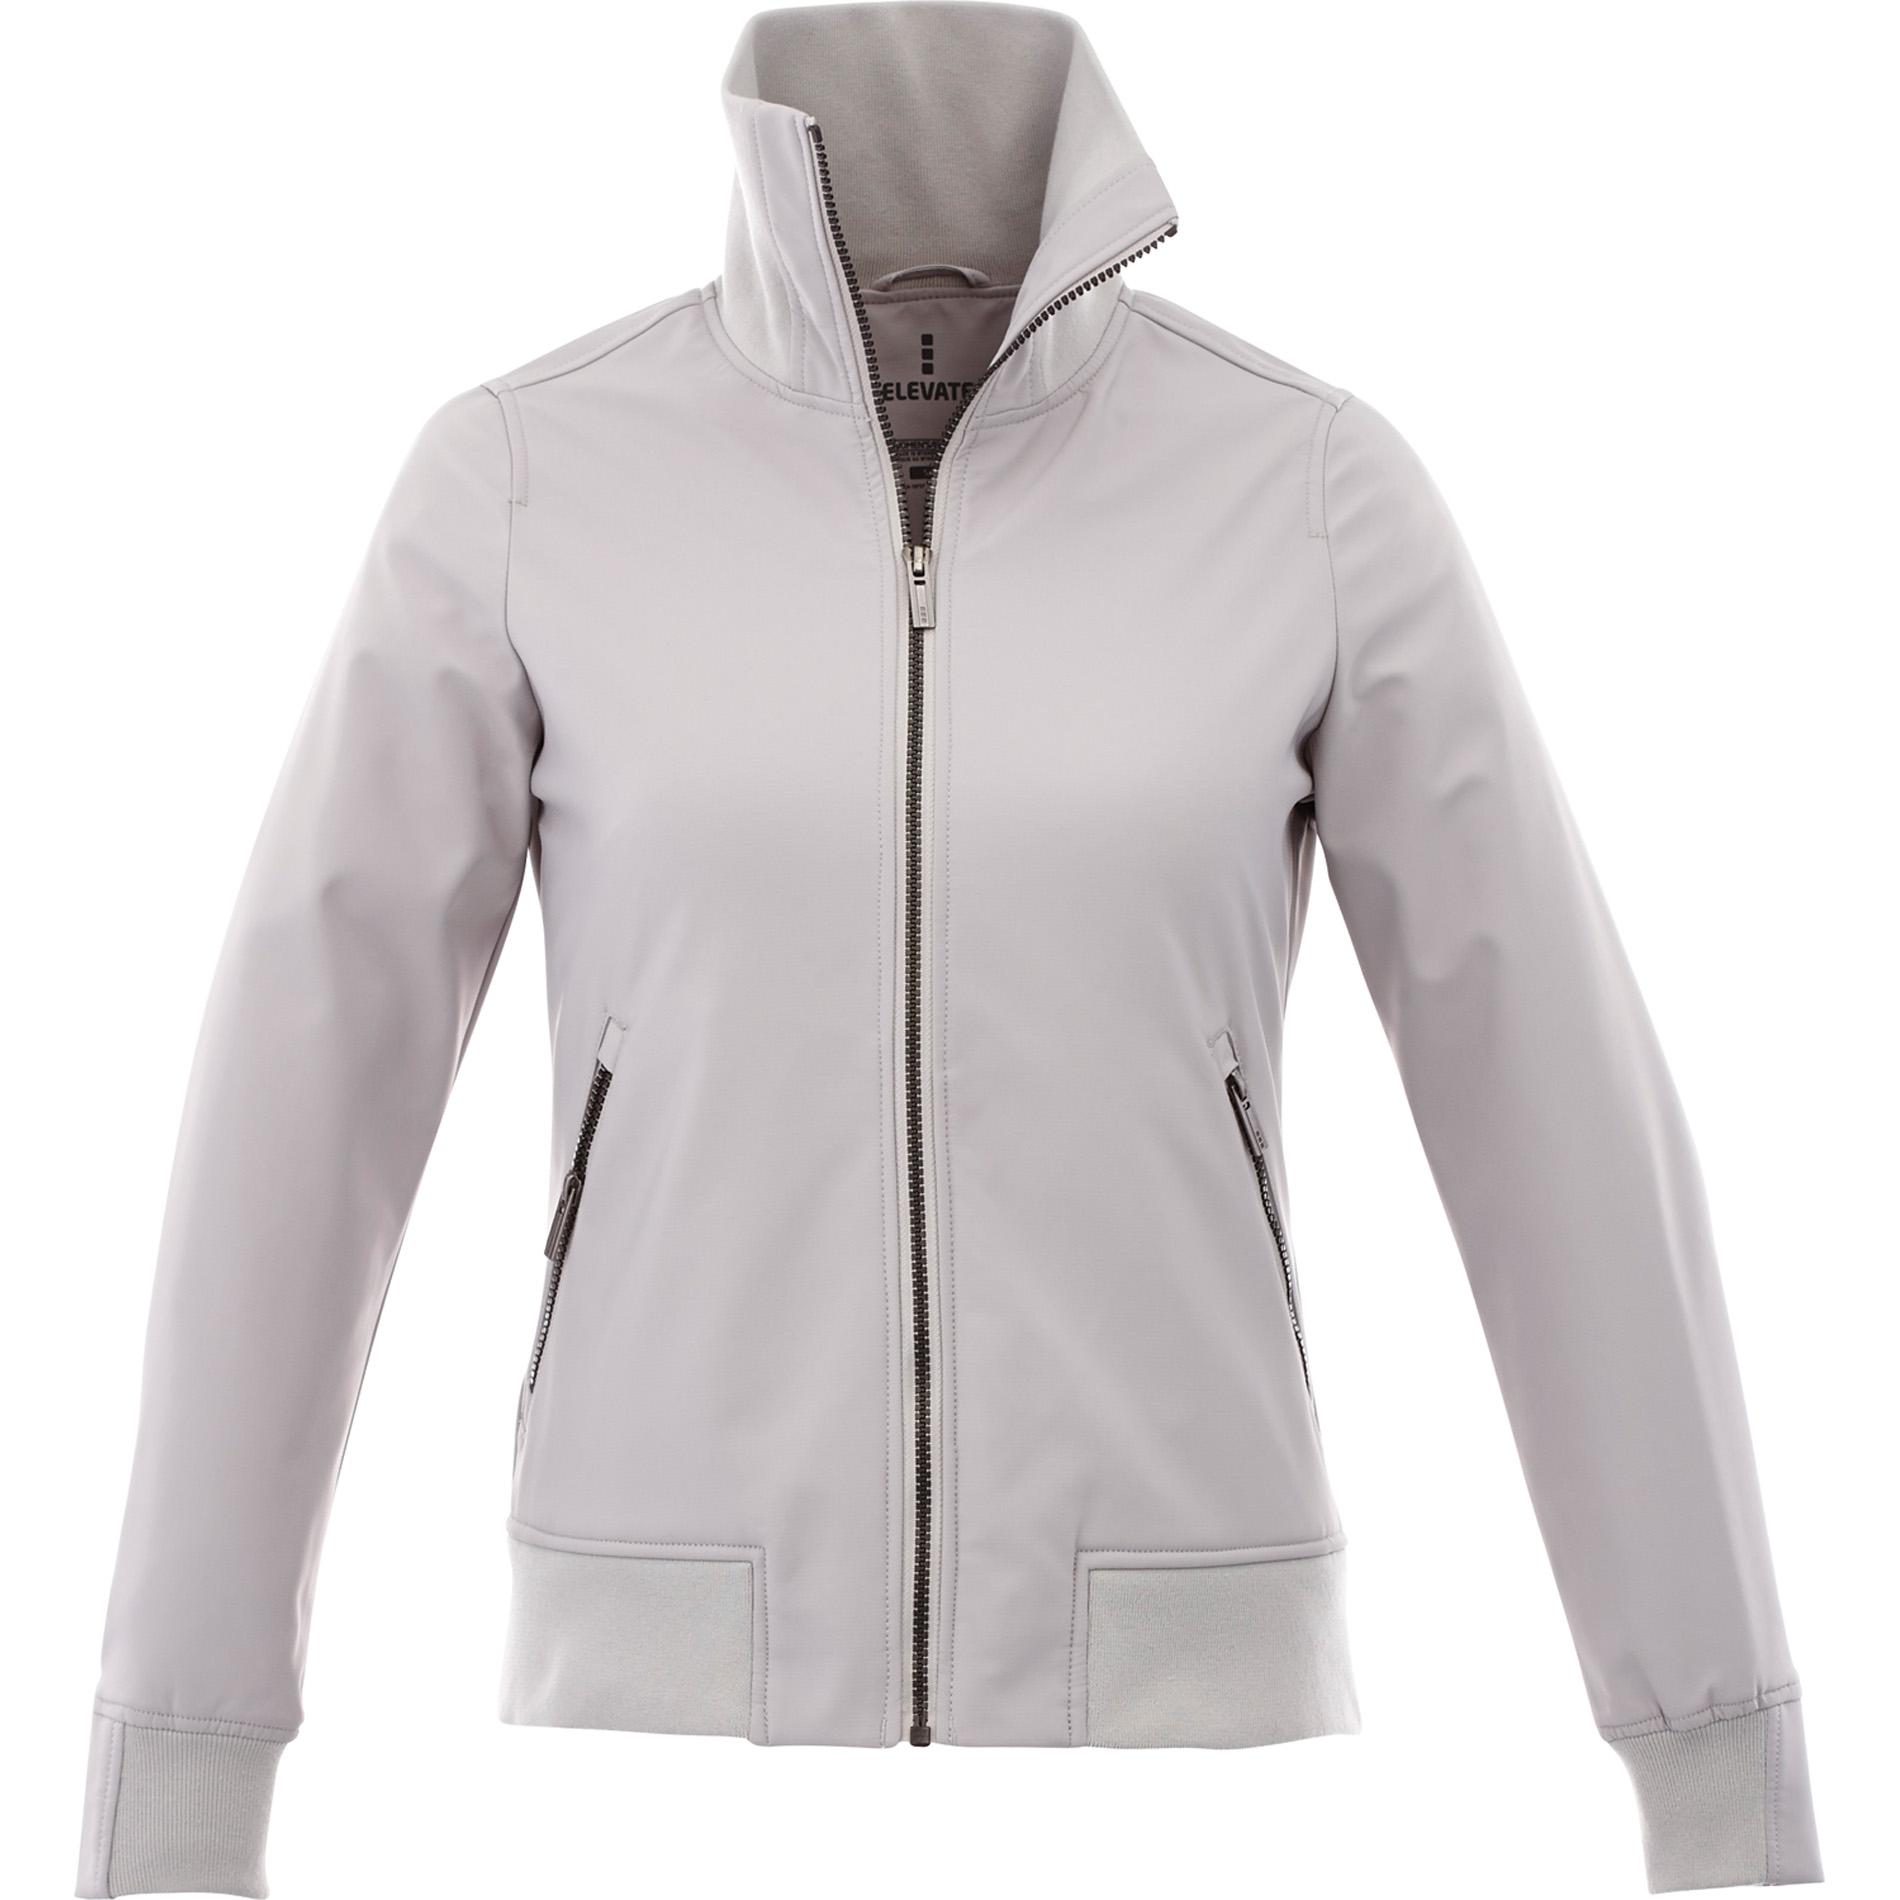 Elevate TM92935 - Women's KENDRICK Softshell Jacket